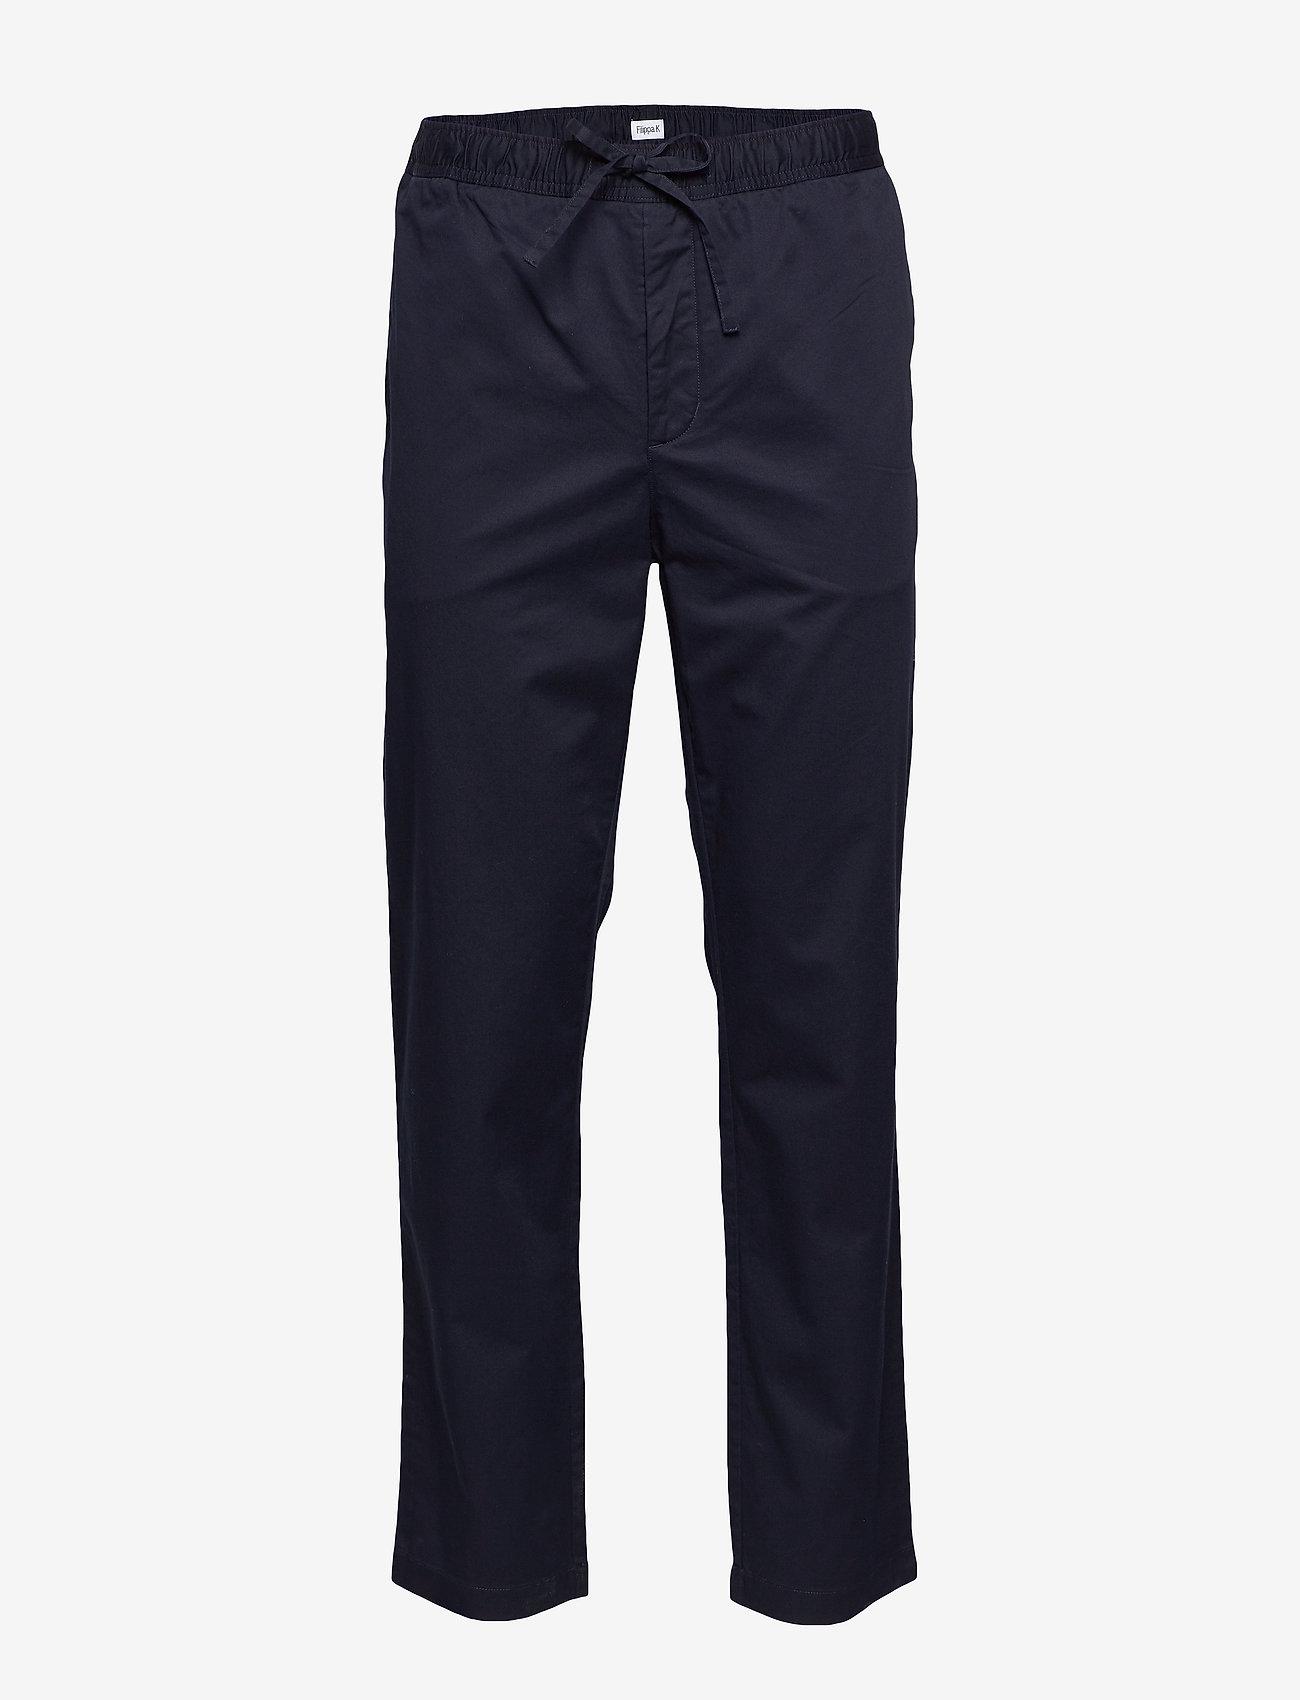 Filippa K - M. Theo Trouser - pantalons décontractés - navy - 0